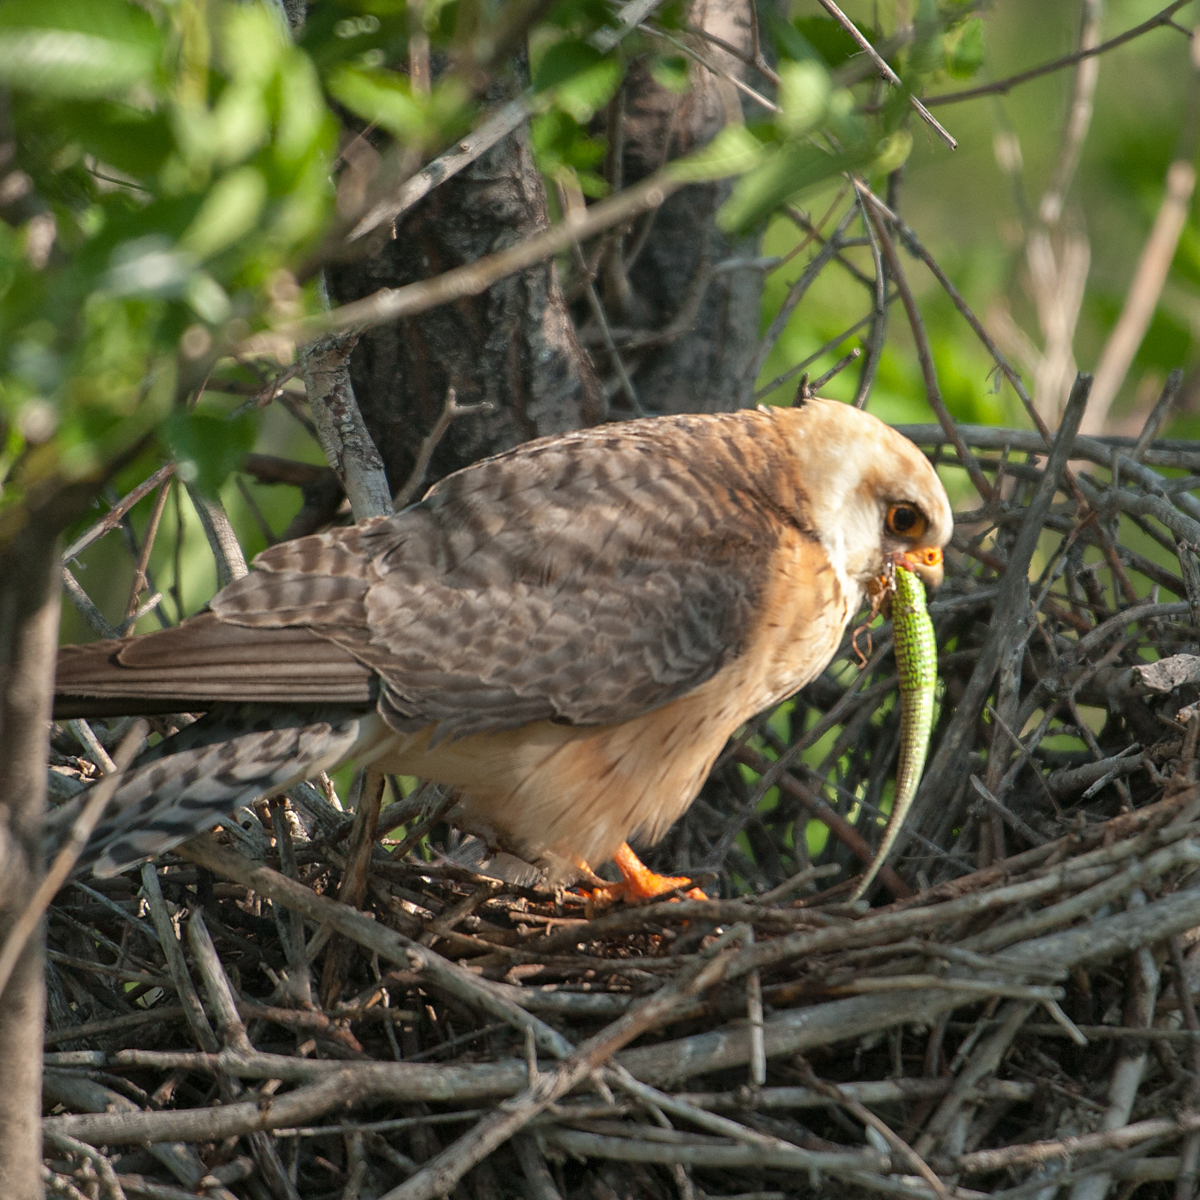 Falco vespertinus; Kasachstan; Red-footed Falcon; Rotfußfalke; beute; birds; capture; echse; eidechse; falconiformes; female; greifvögel; hunting; jagd; kriechtiere; lizards; pröhl; raptors; reptilia; vögel; weibchen